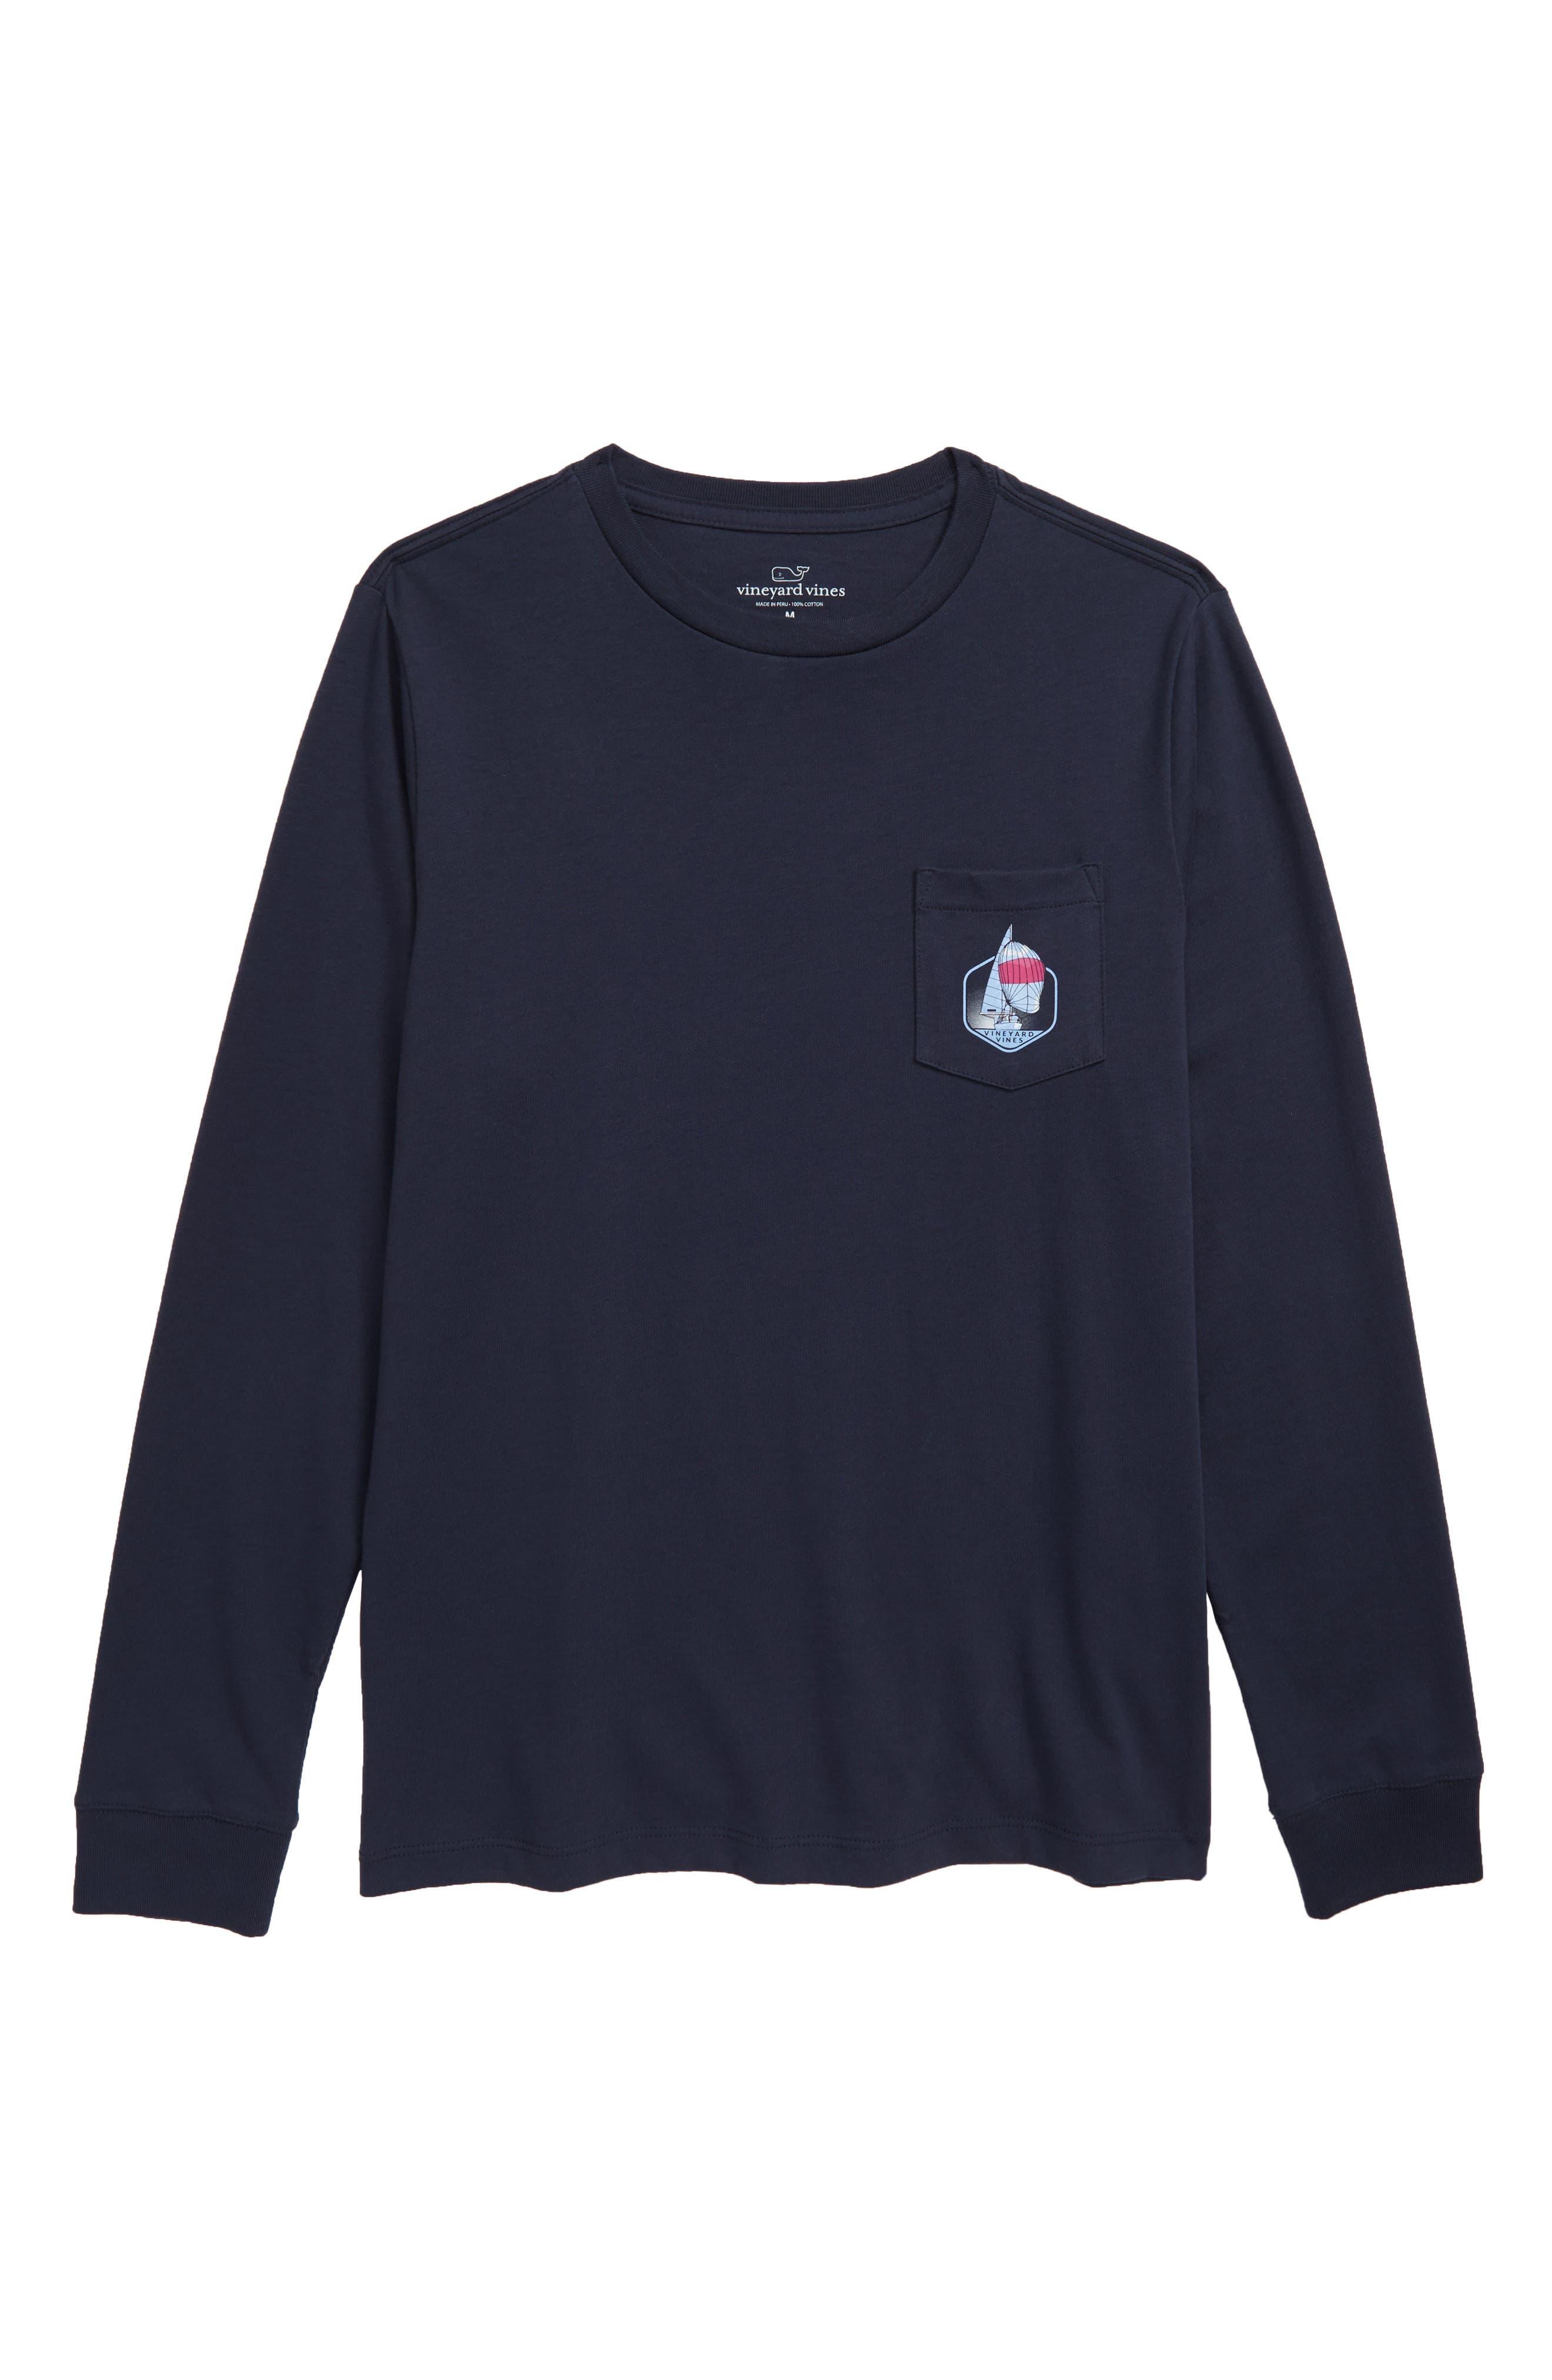 3e1f75f7 Kids' Vineyard Vines Apparel: T-Shirts, Jeans, Pants & Hoodies | Nordstrom